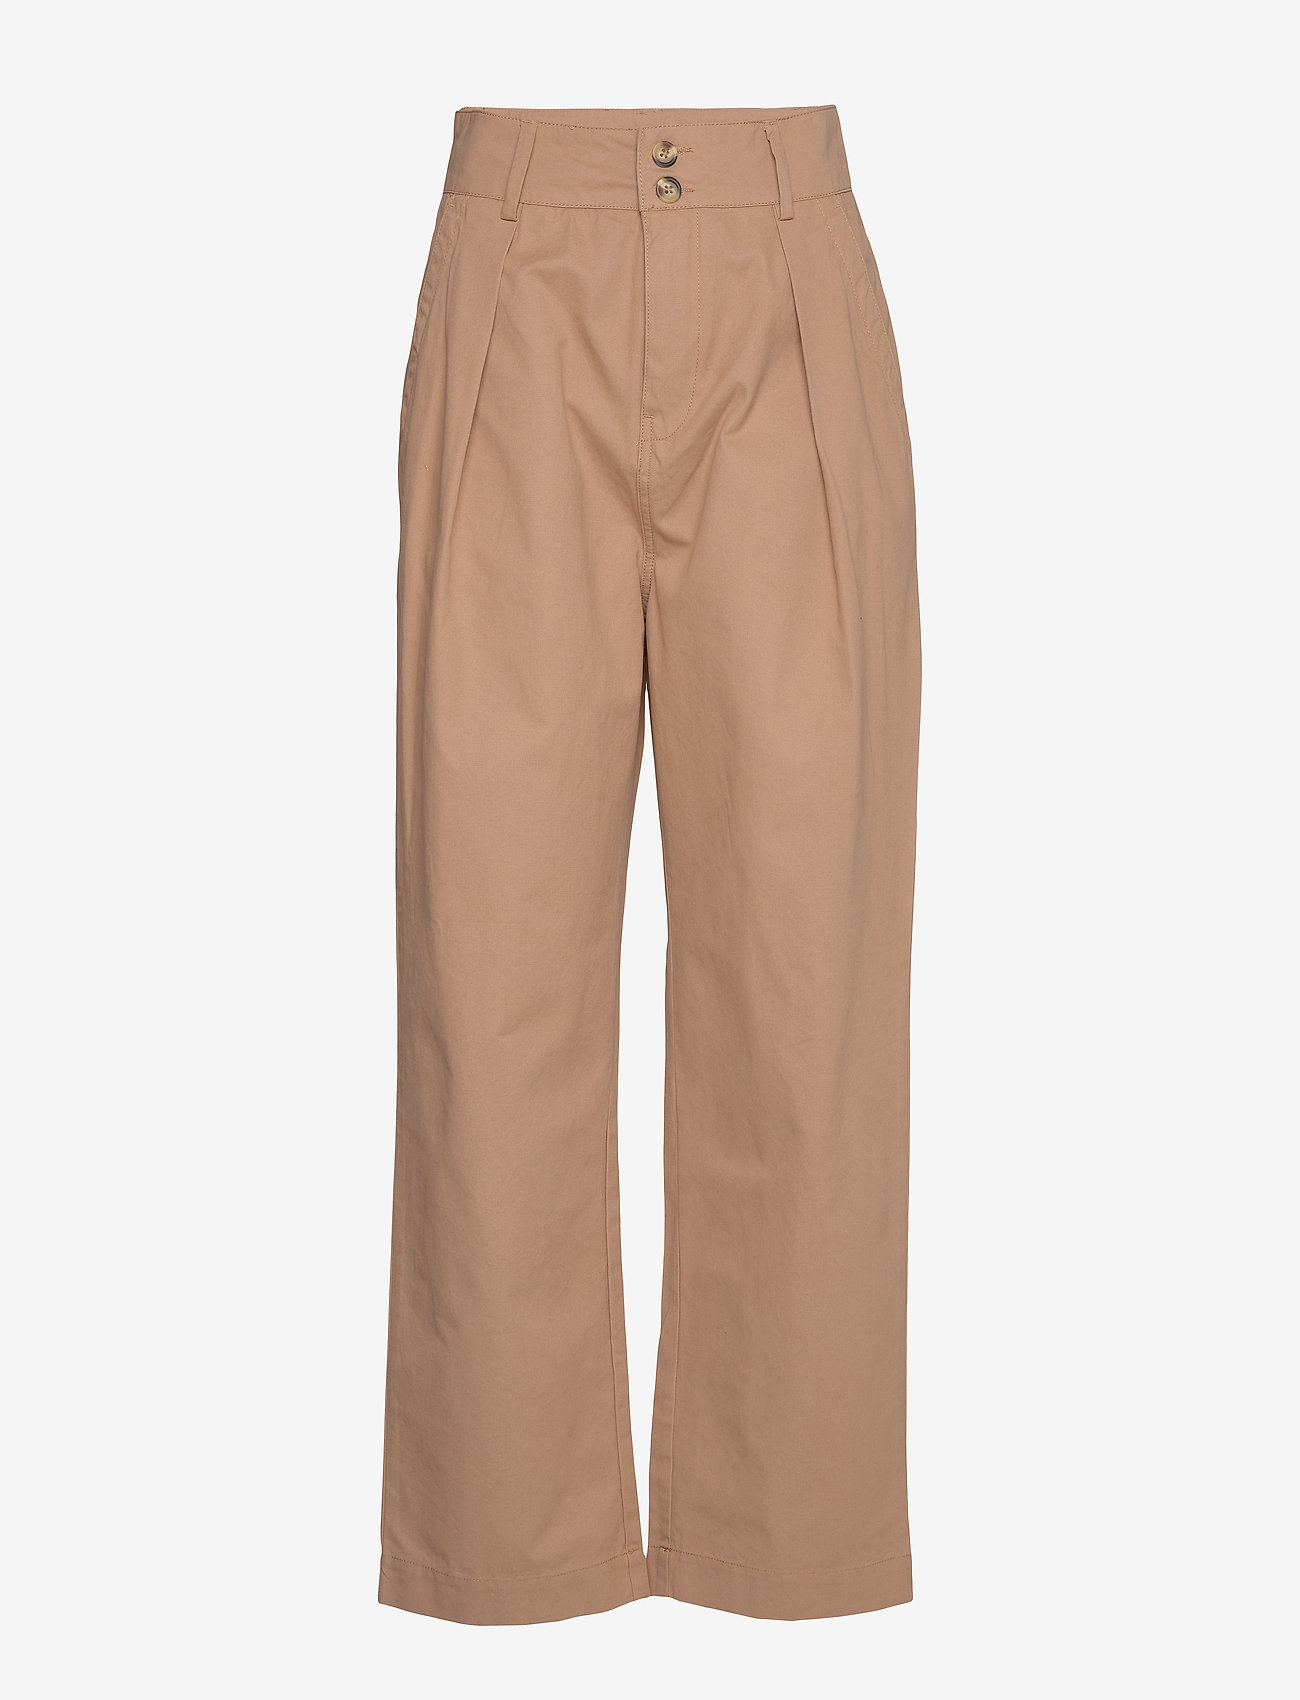 InWear MonaIW Pleat Pants - Bukser AMPHORA - Dameklær Spesialtilbud